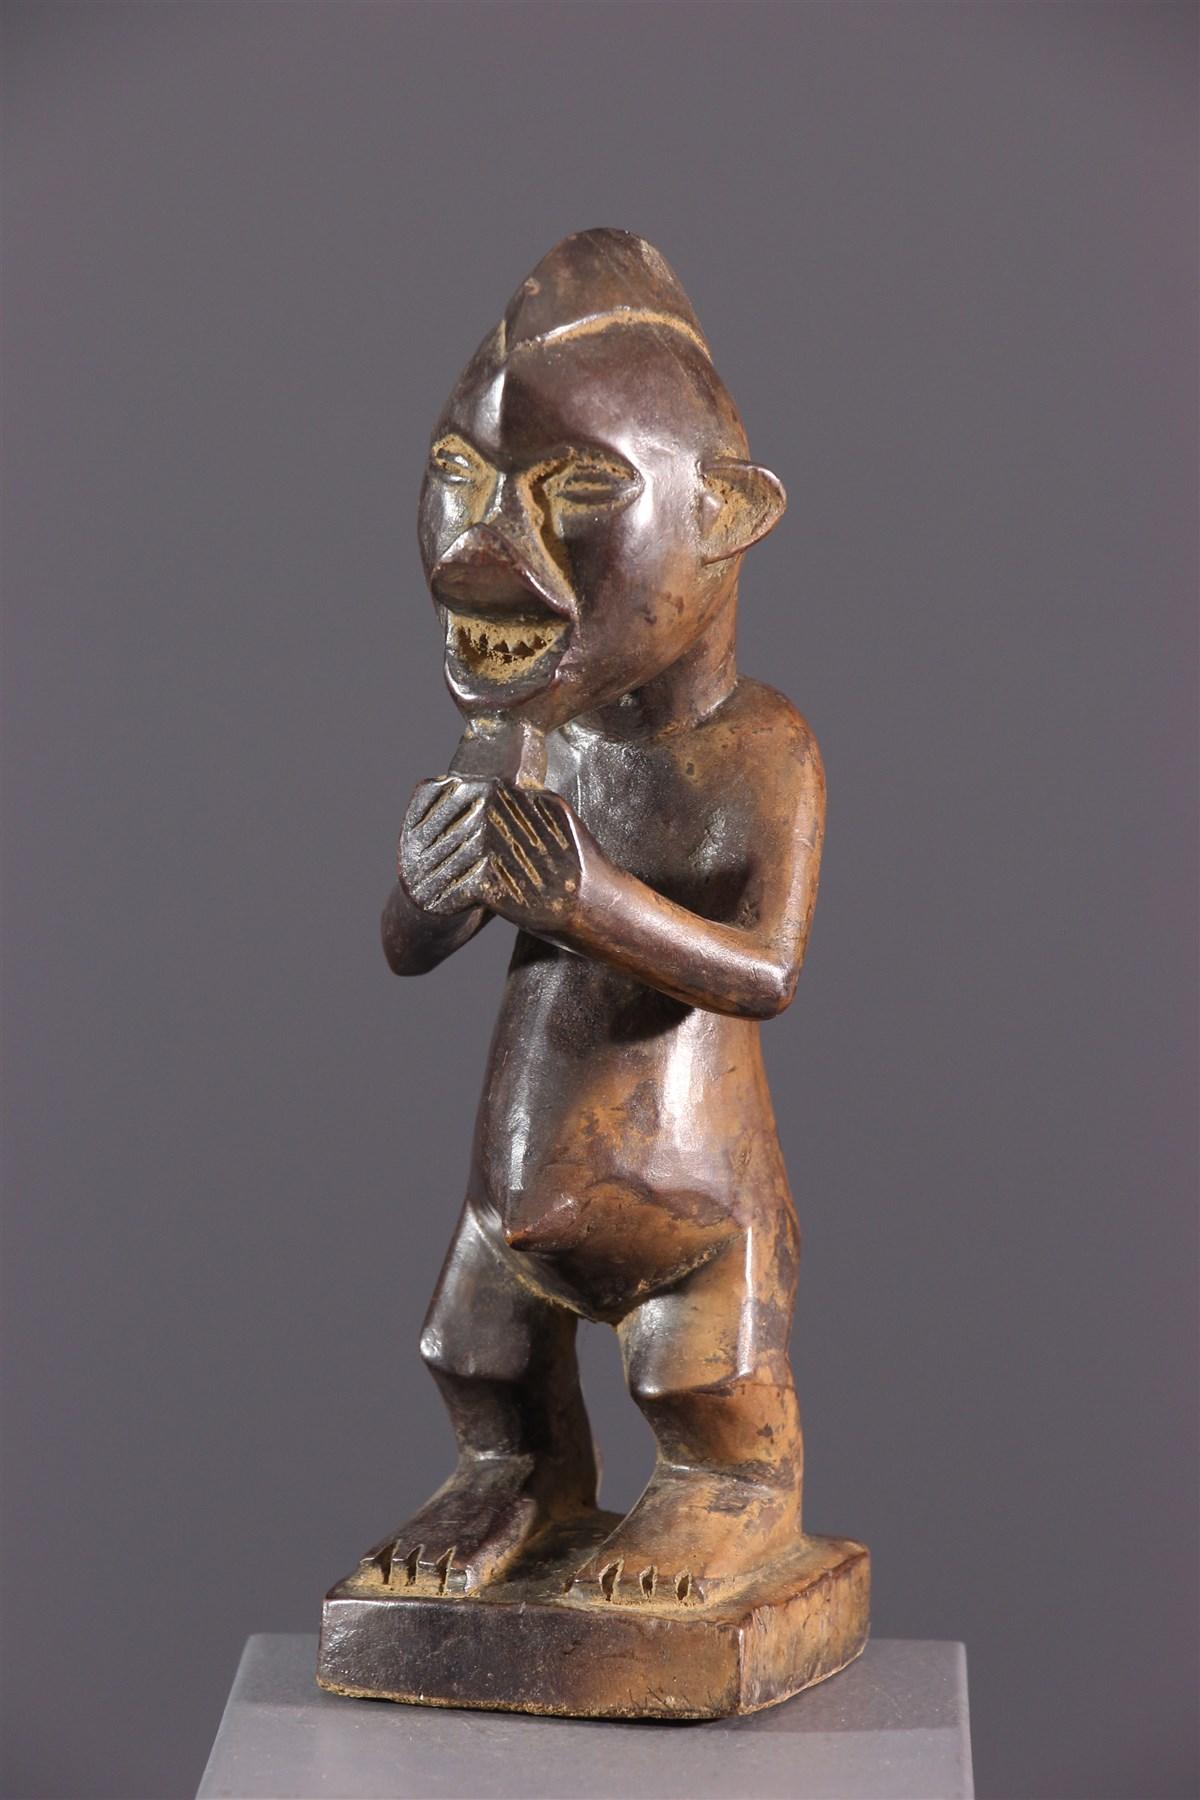 Statuette cultuelle Yiteke Yaka - Art africain